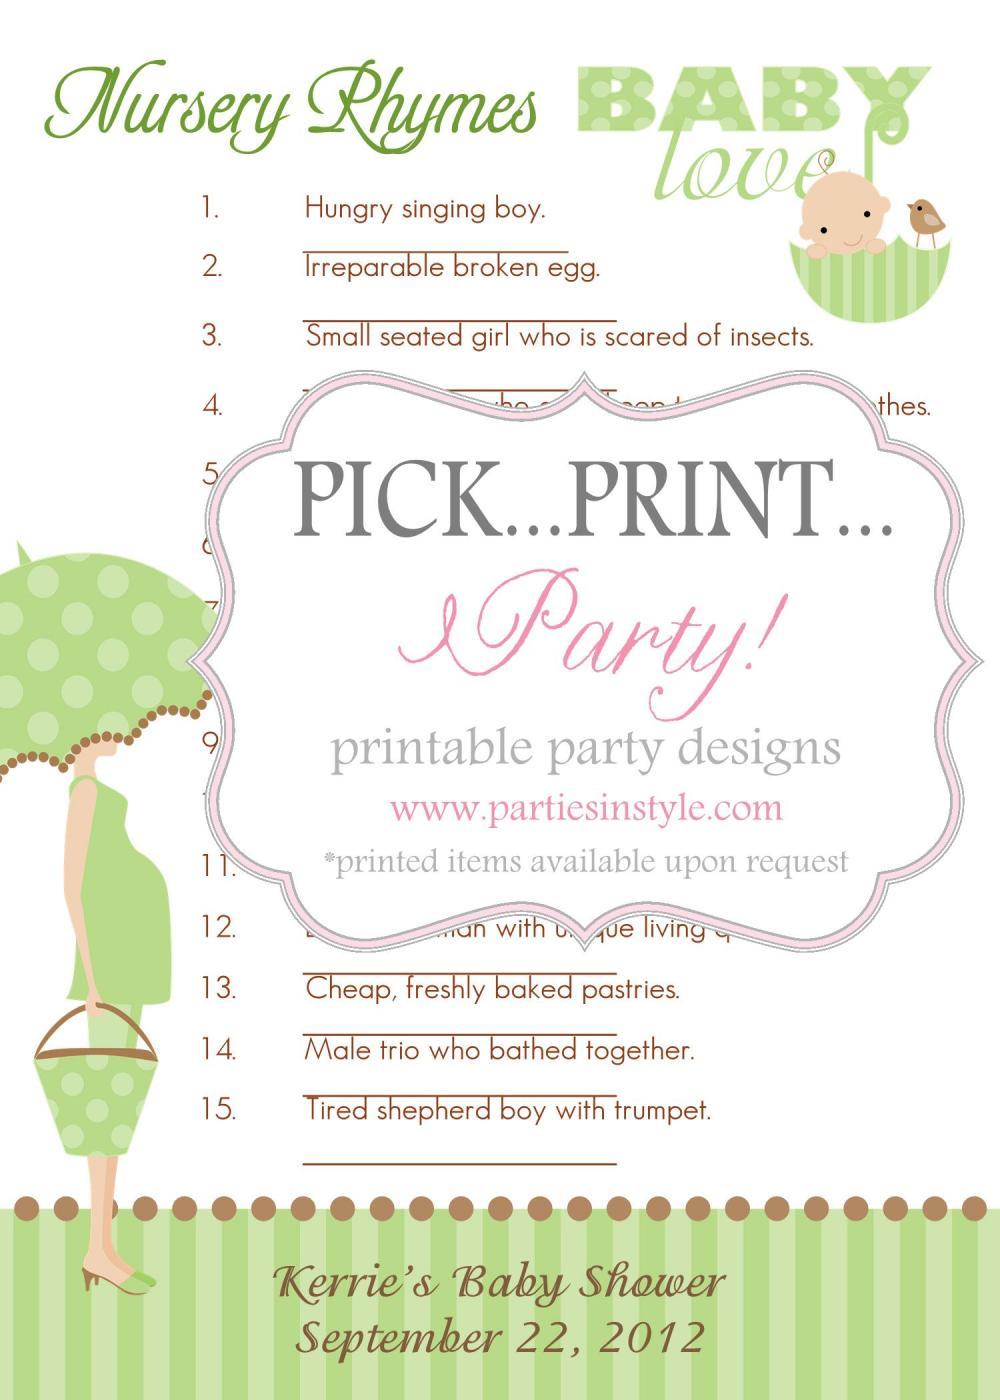 Baby Shower Game - Guess the Nursery Rhyme - Printable DIY